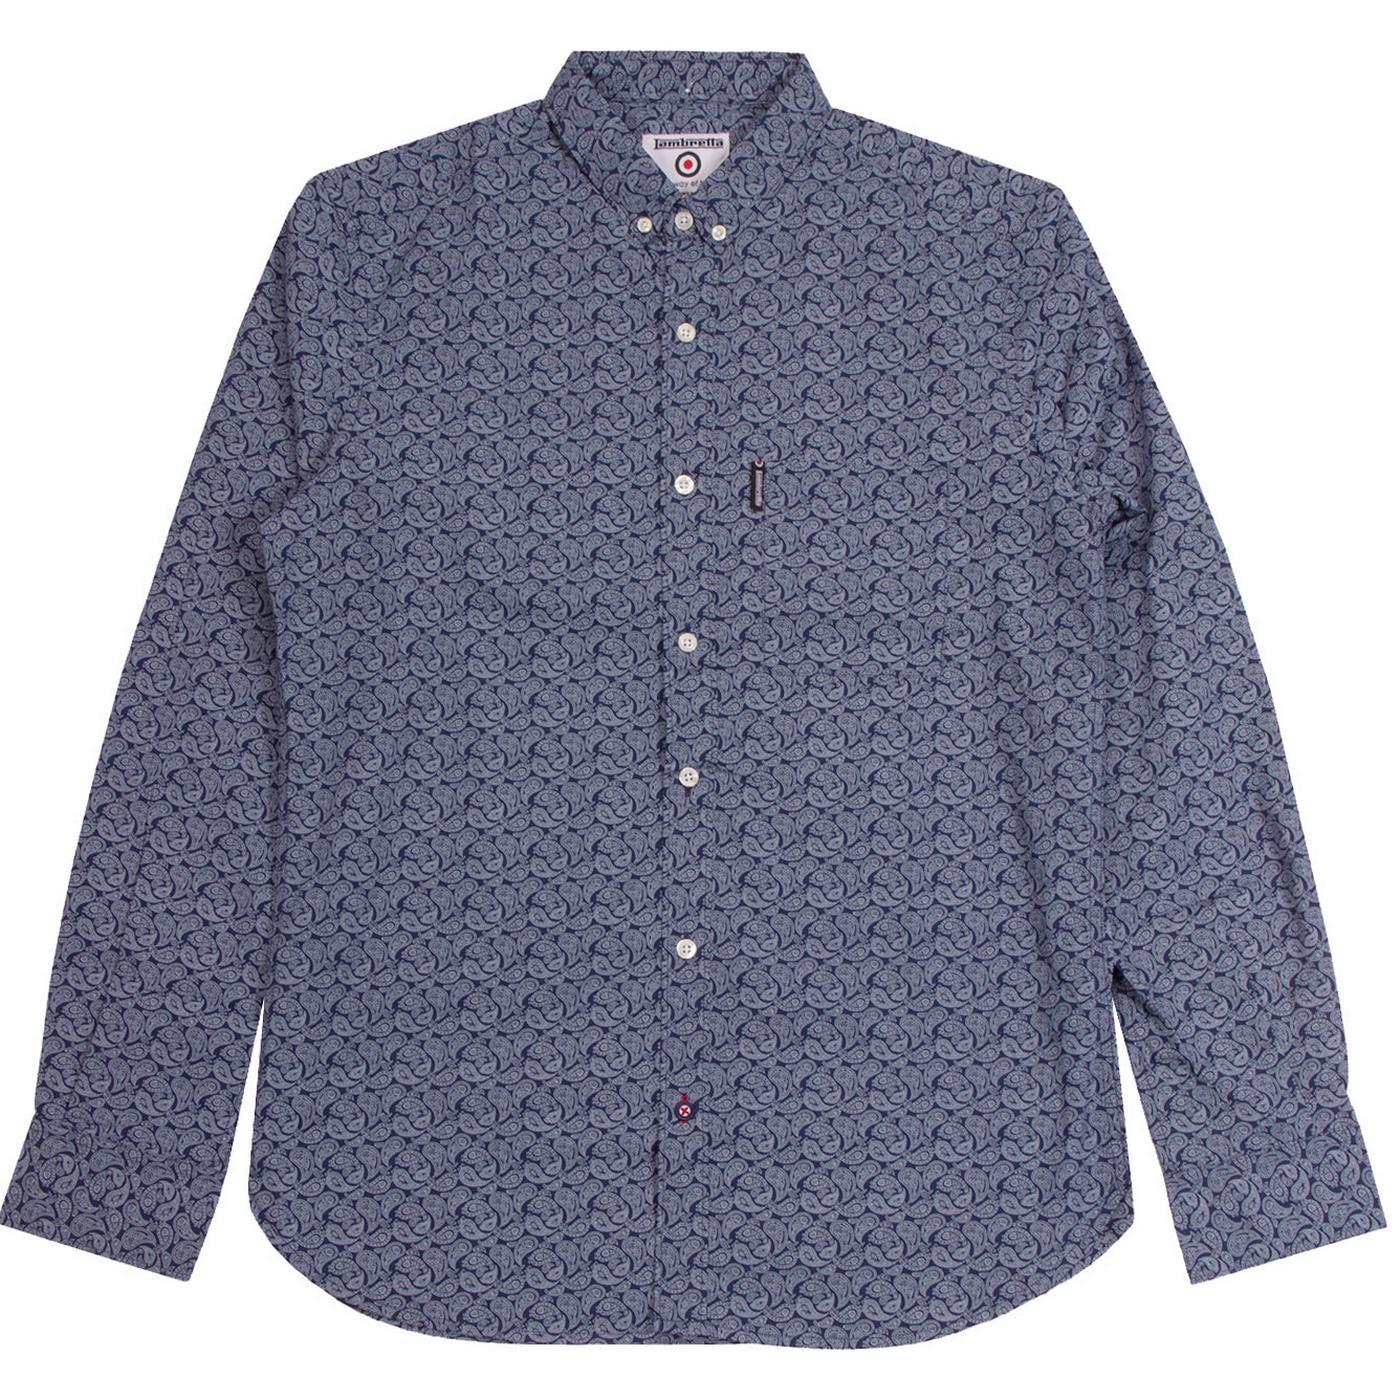 LAMBRETTA All Over Print Sixties Paisley Shirt N/W